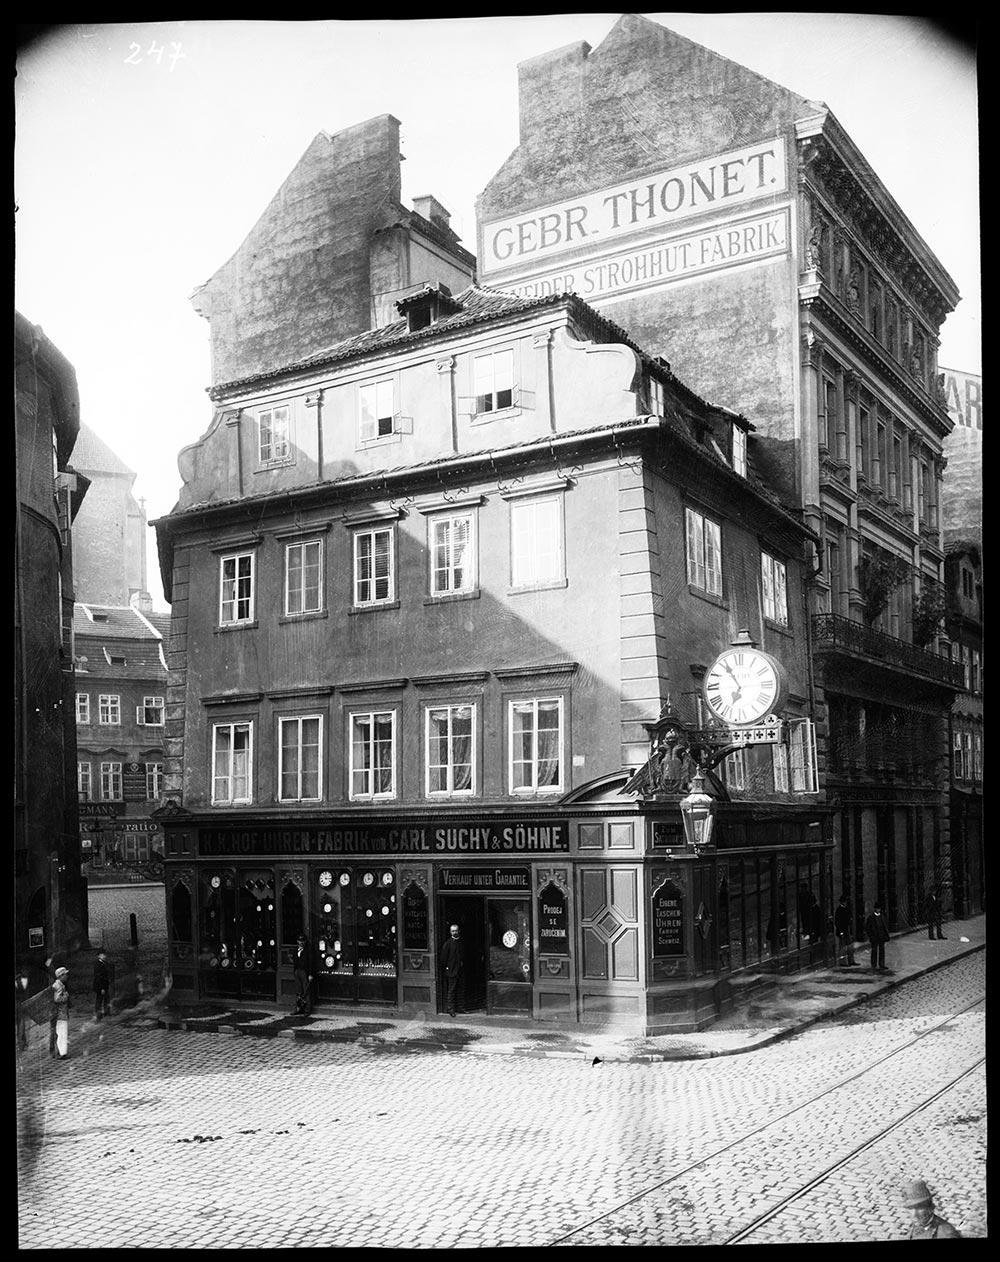 Carl Suchy & Söhne clock factory in Prague, then part of the Austrian Empire